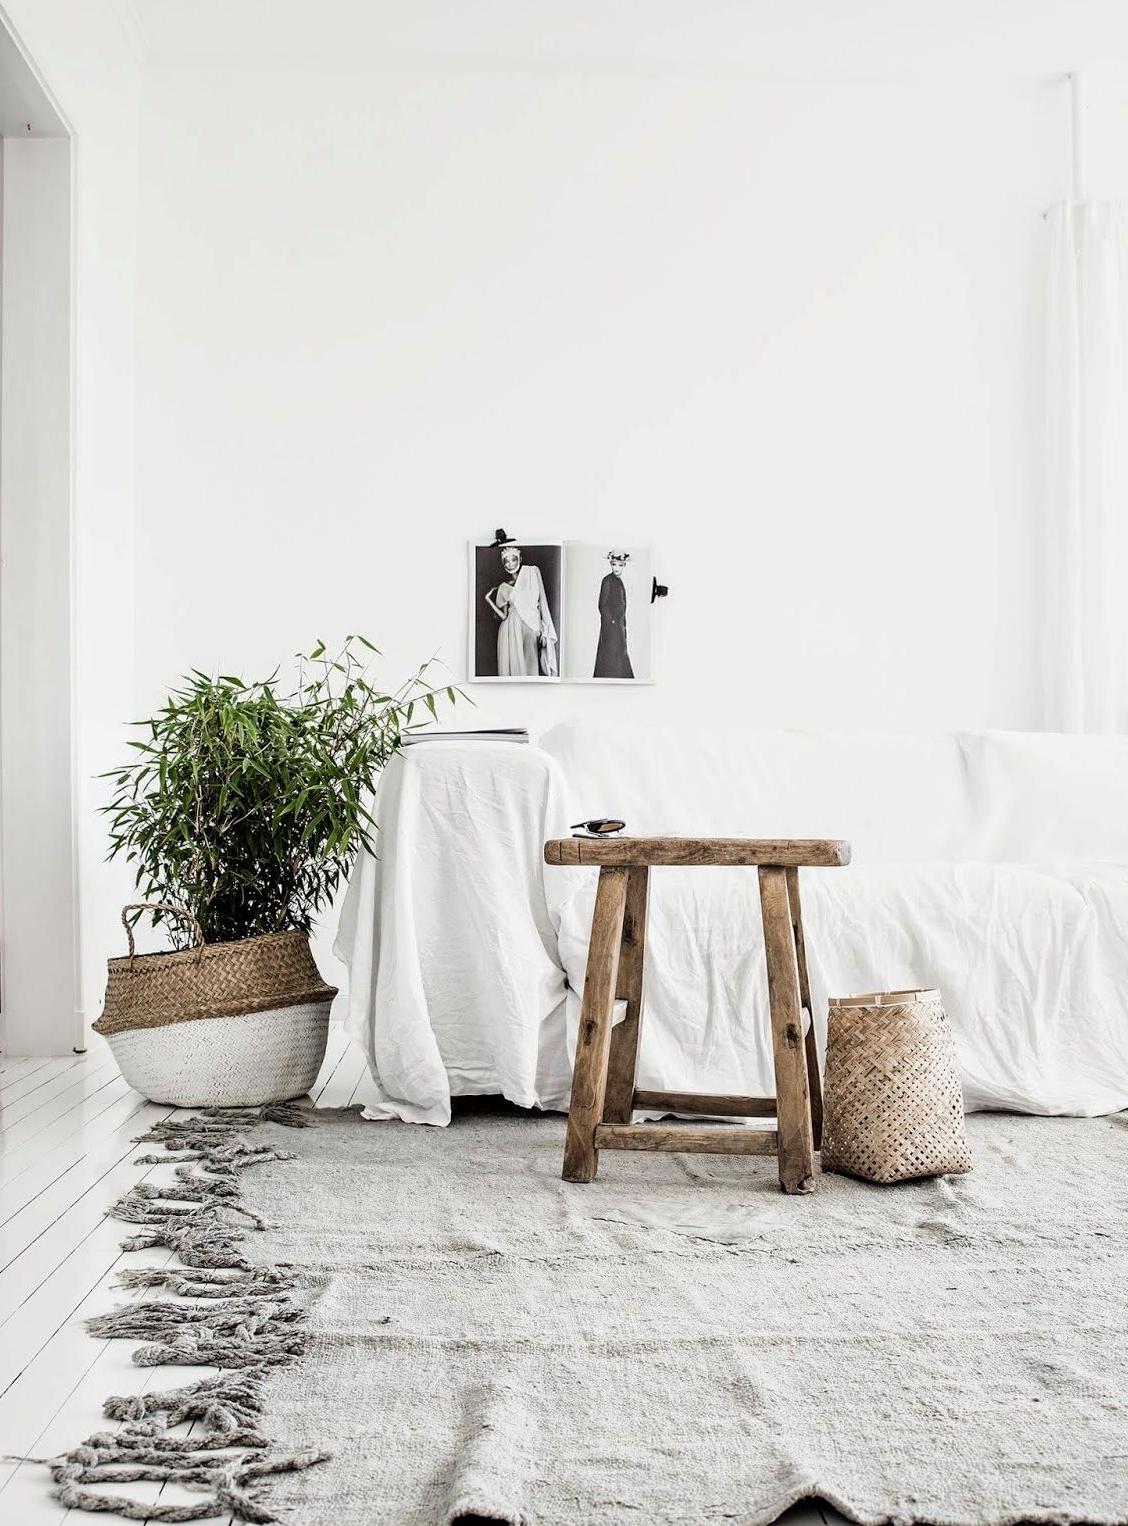 fibras naturales - cestos